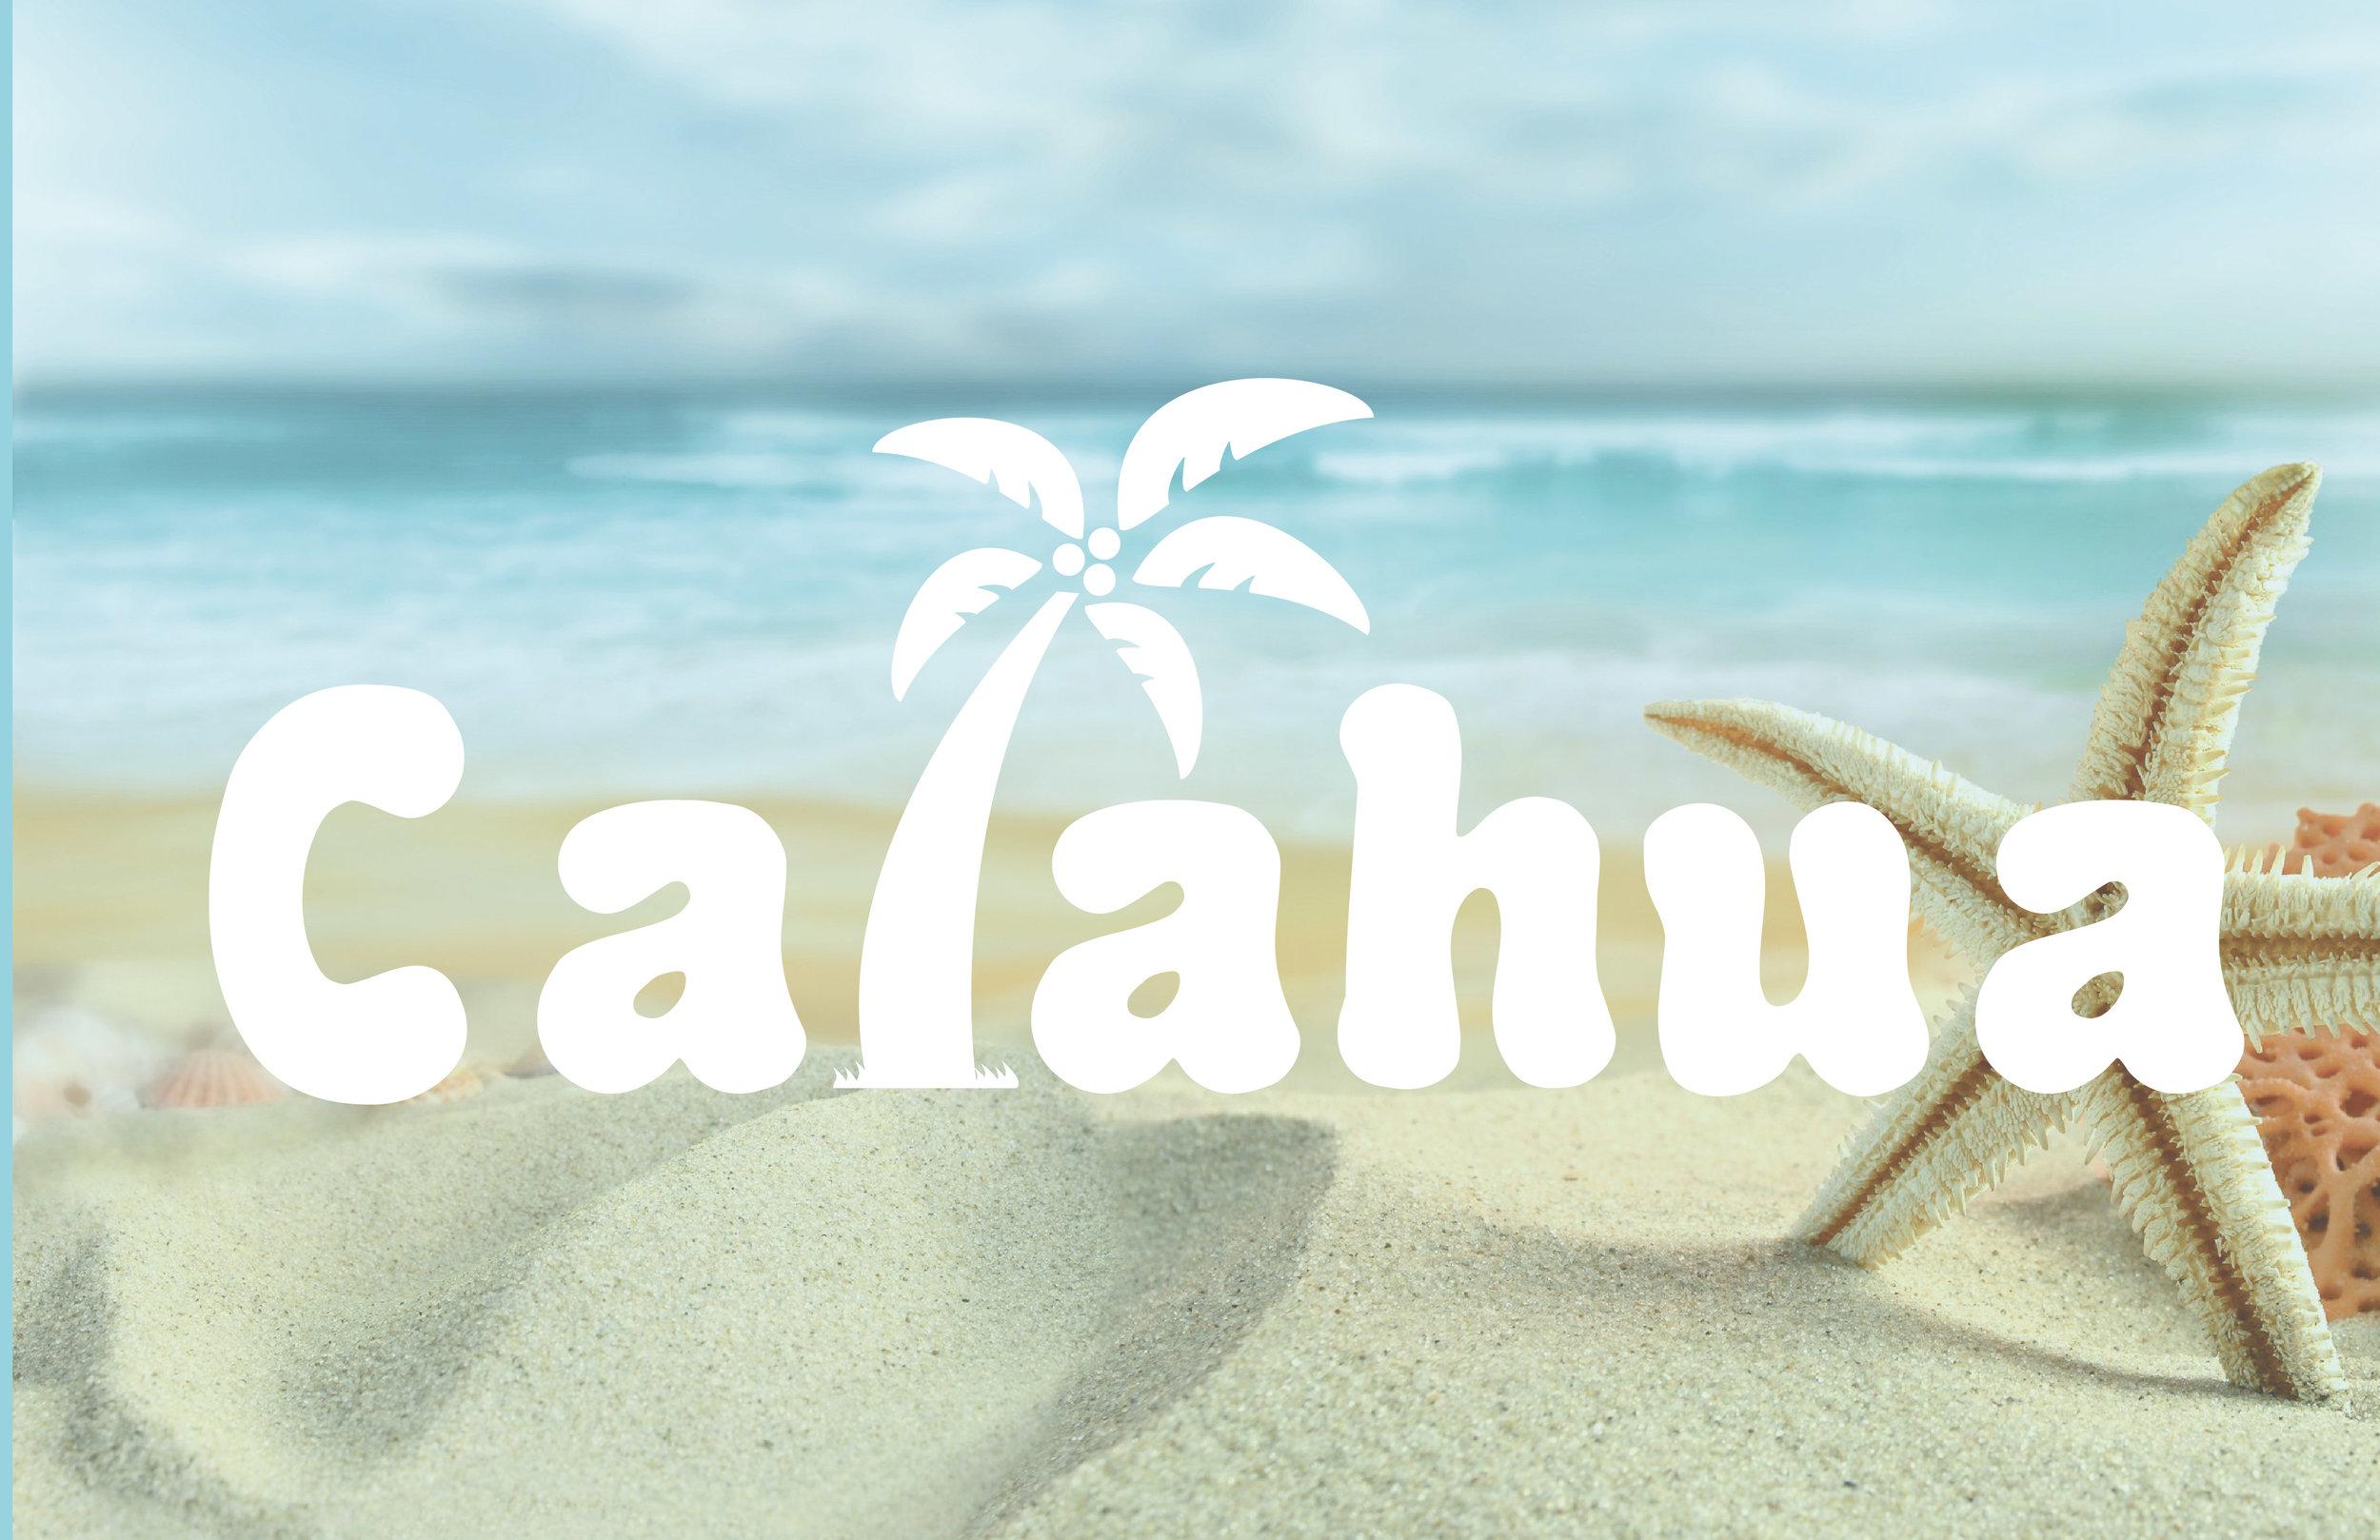 Calahua-01.jpg